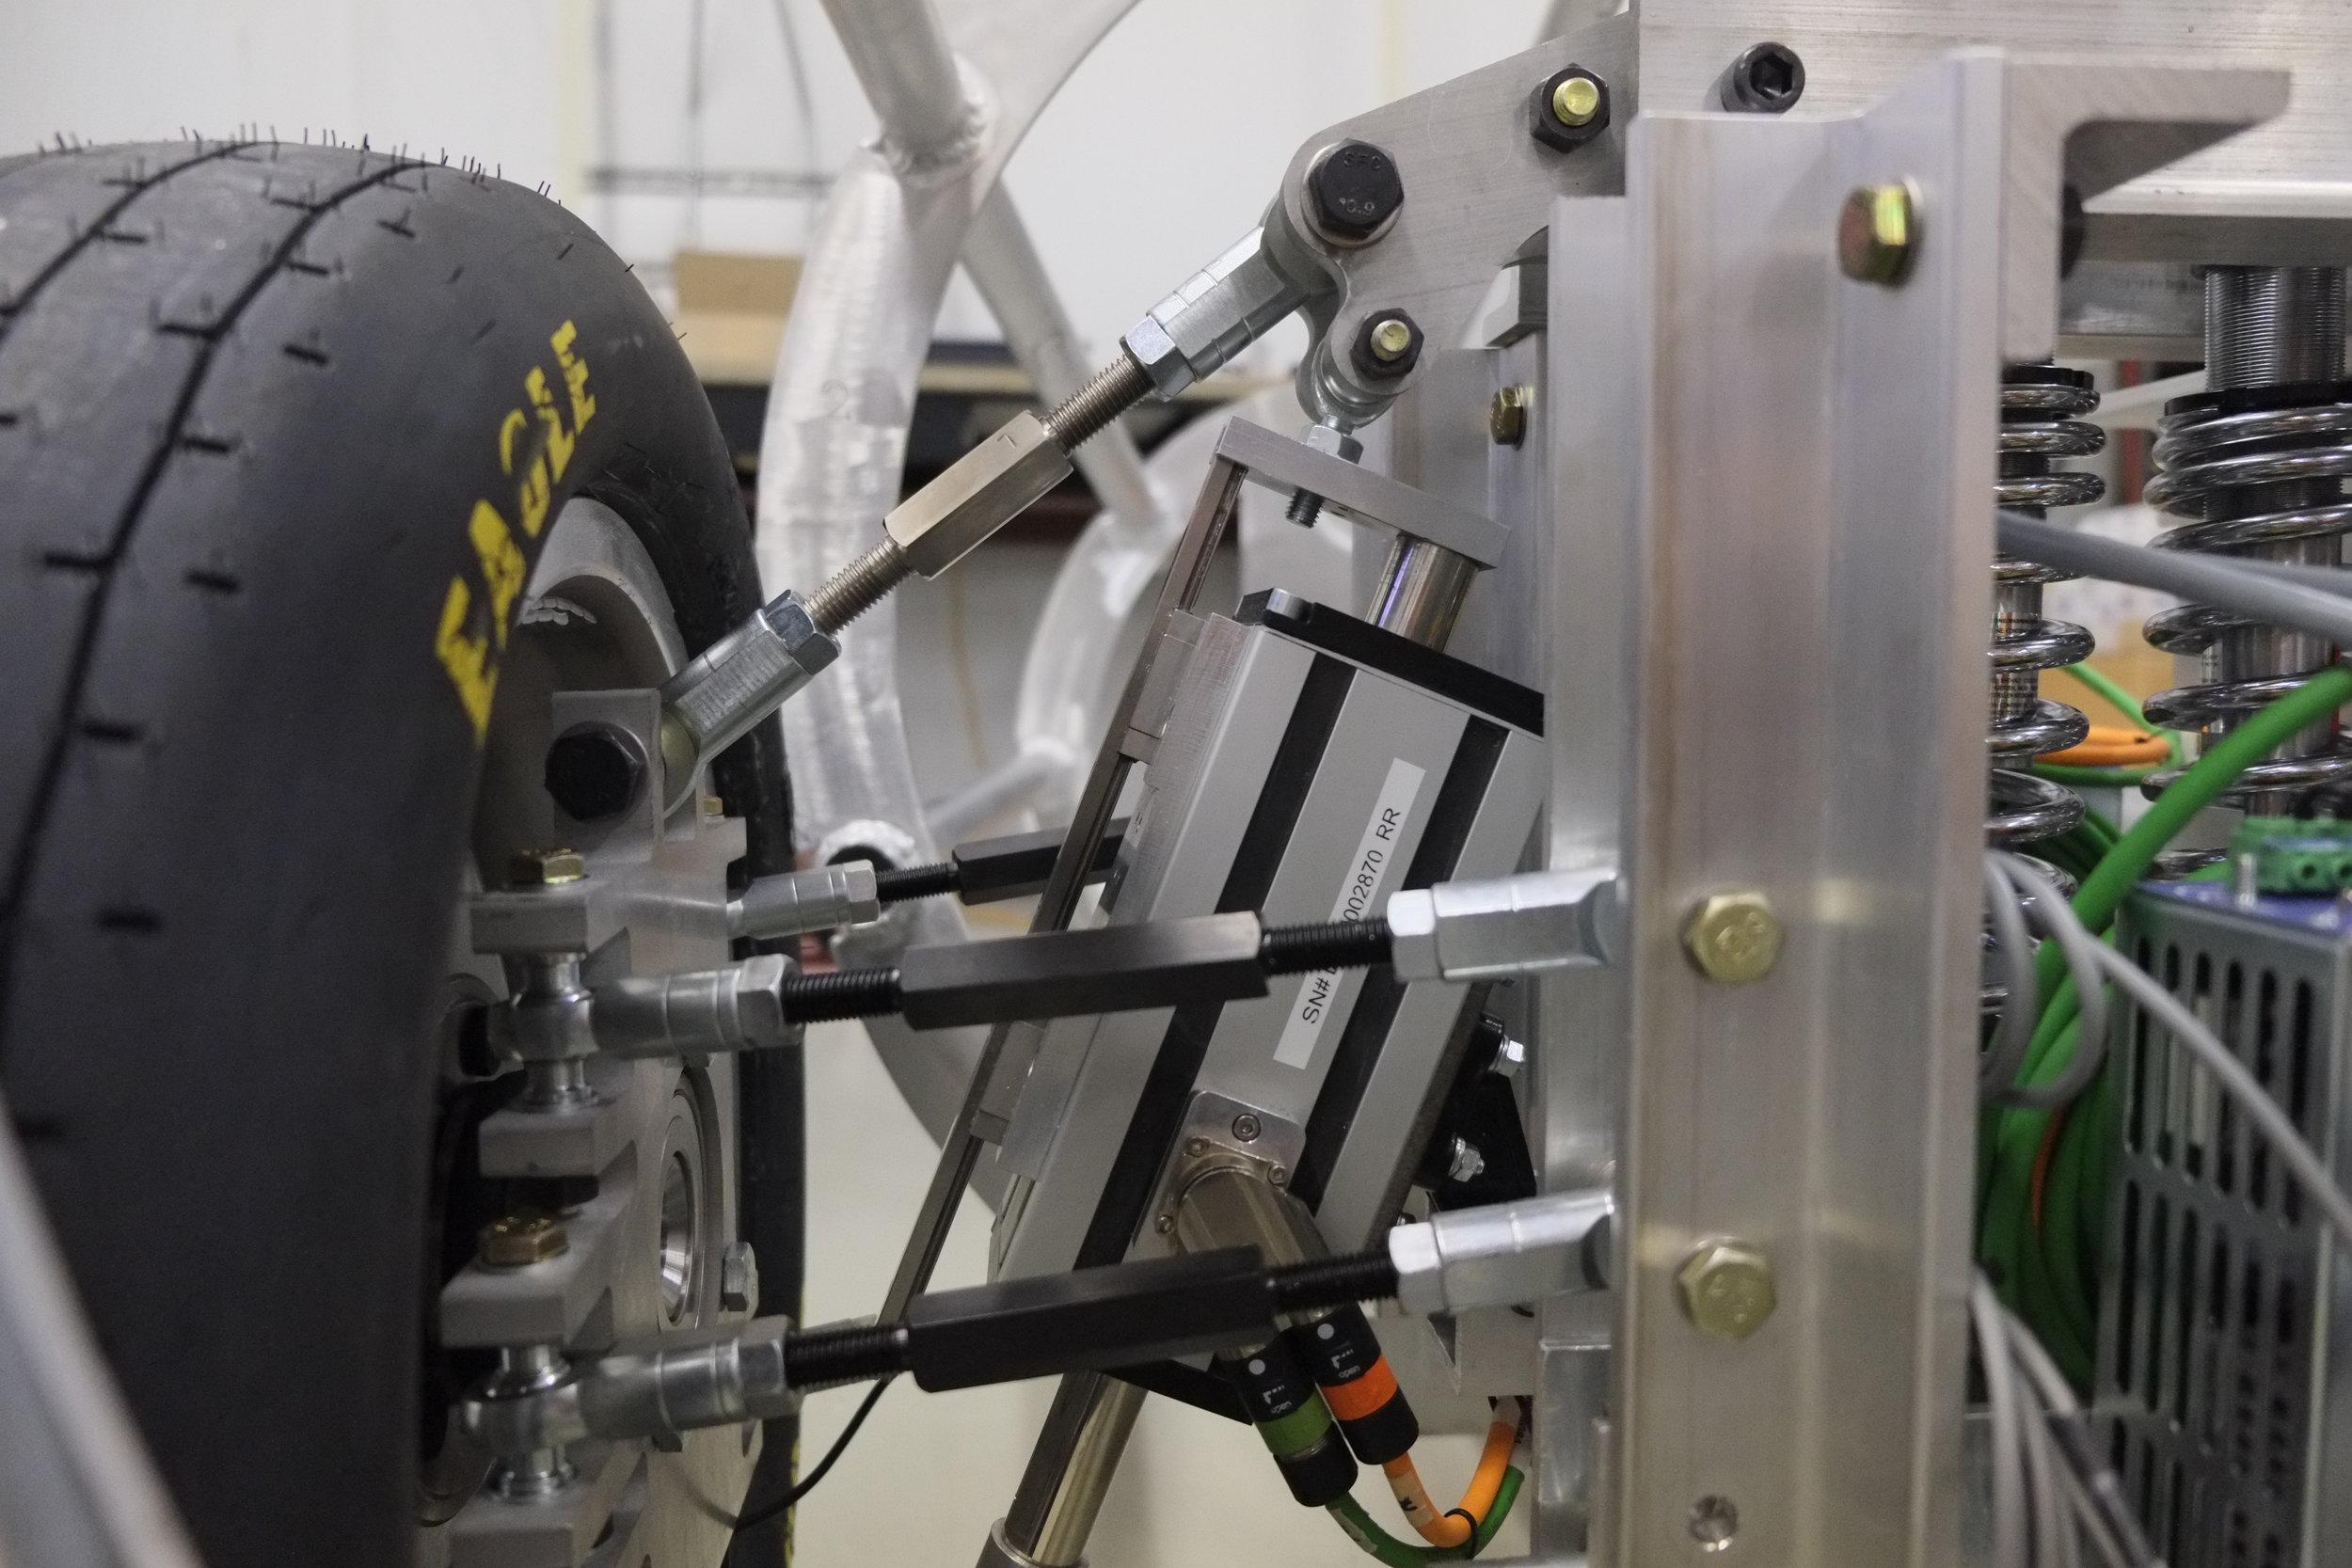 A detail of ales tech's suspension on uf Gatorloop's pod